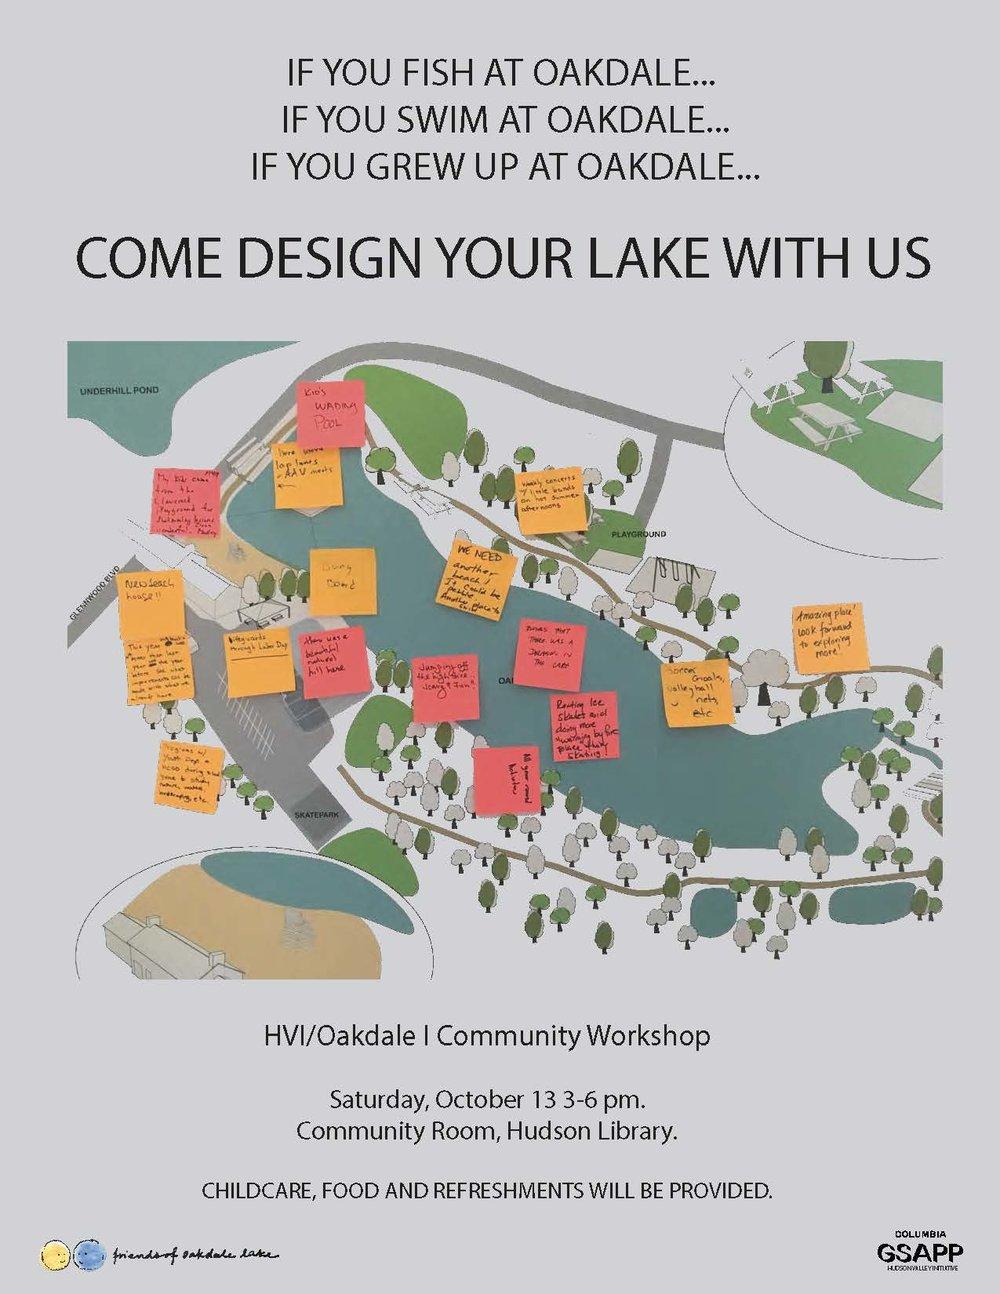 1013 Oakdale Community Workshop Poster.jpg